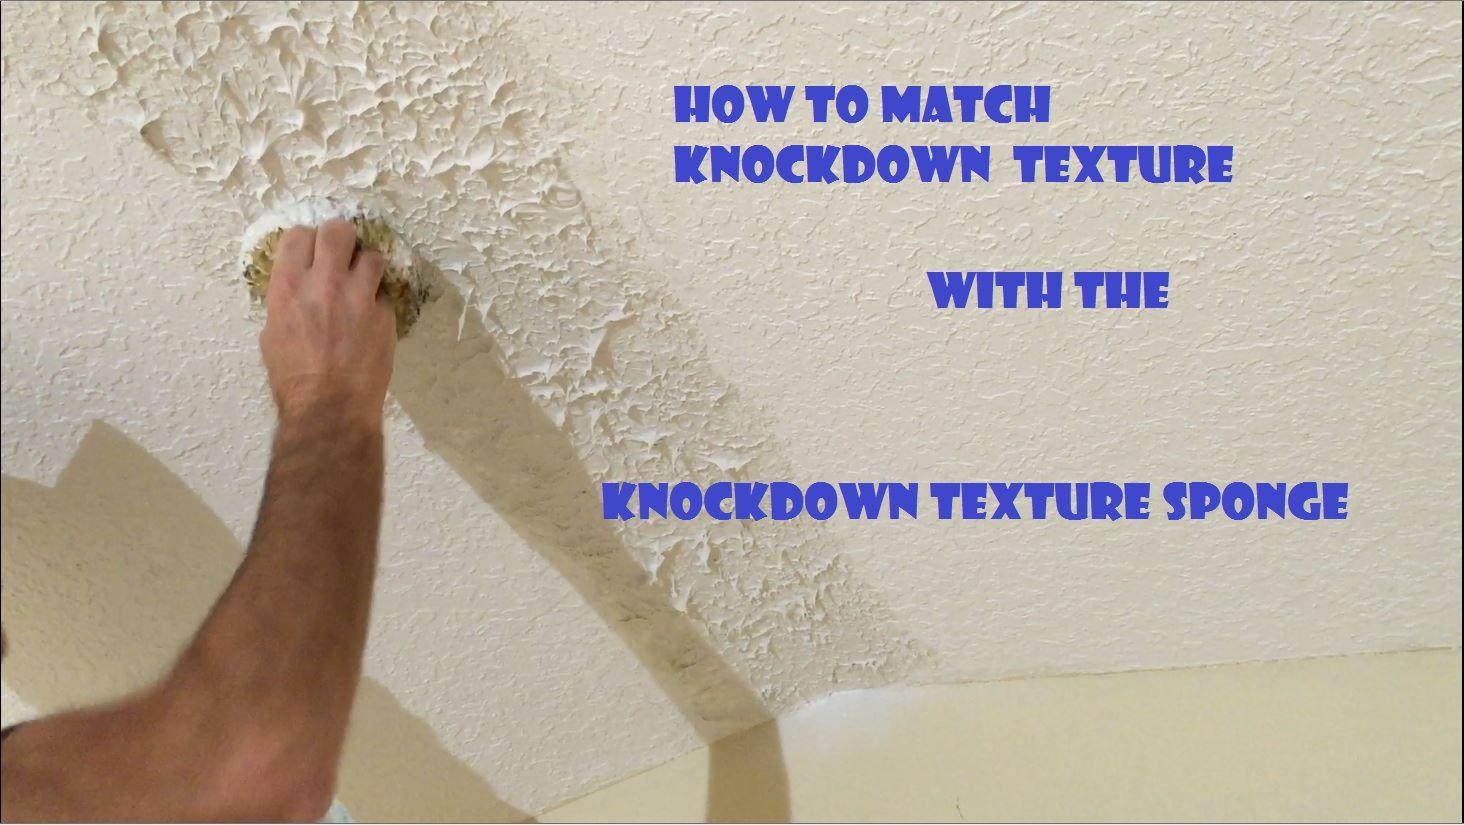 Knockdown Texture Sponge Drywall